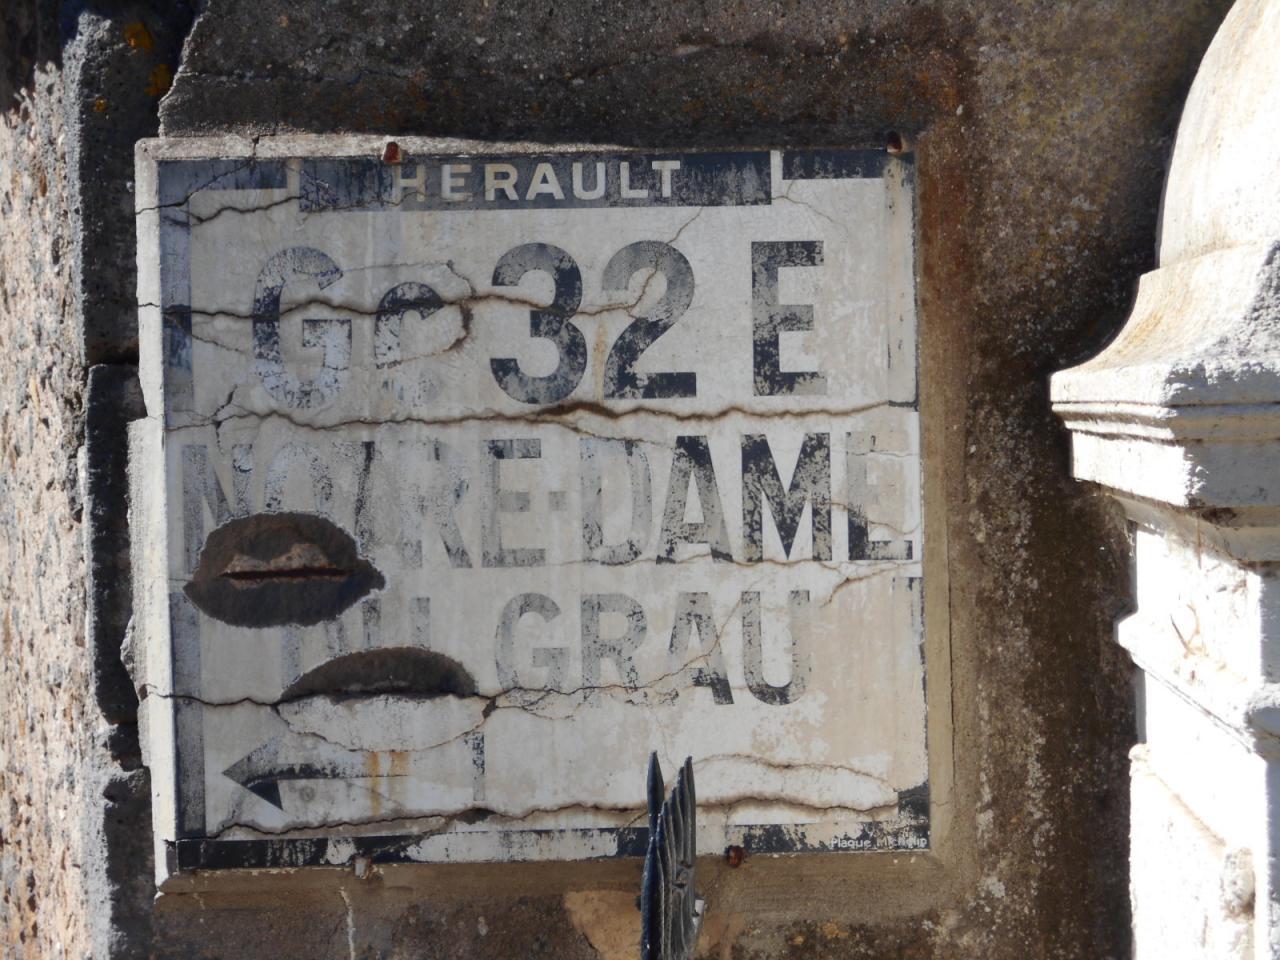 34300 Le Grau d'Agde (2)